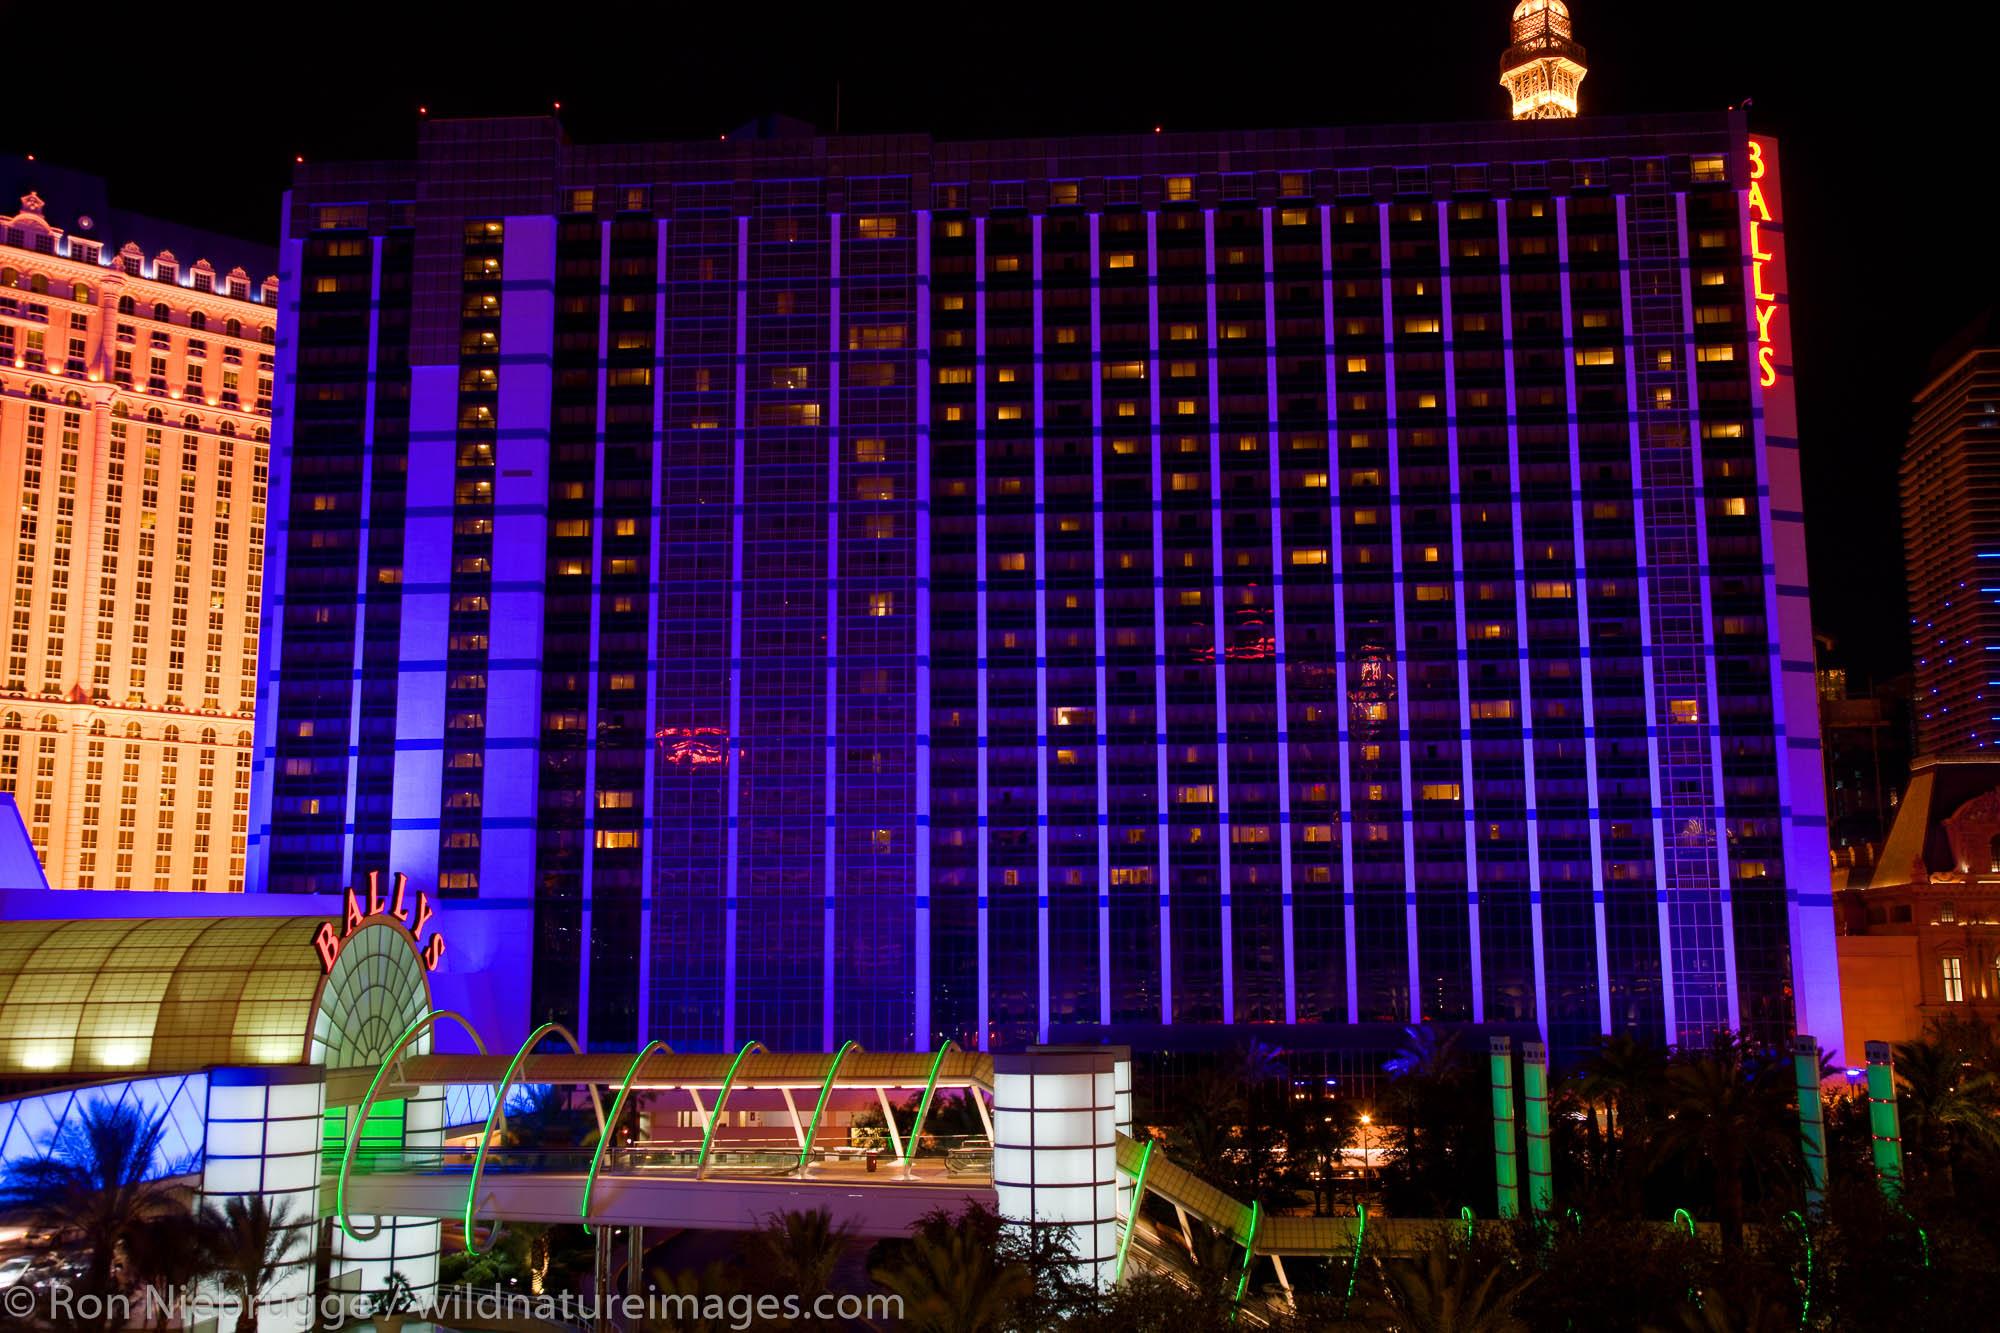 Ballys Hotel and Casino, Las Vegas, Nevada.